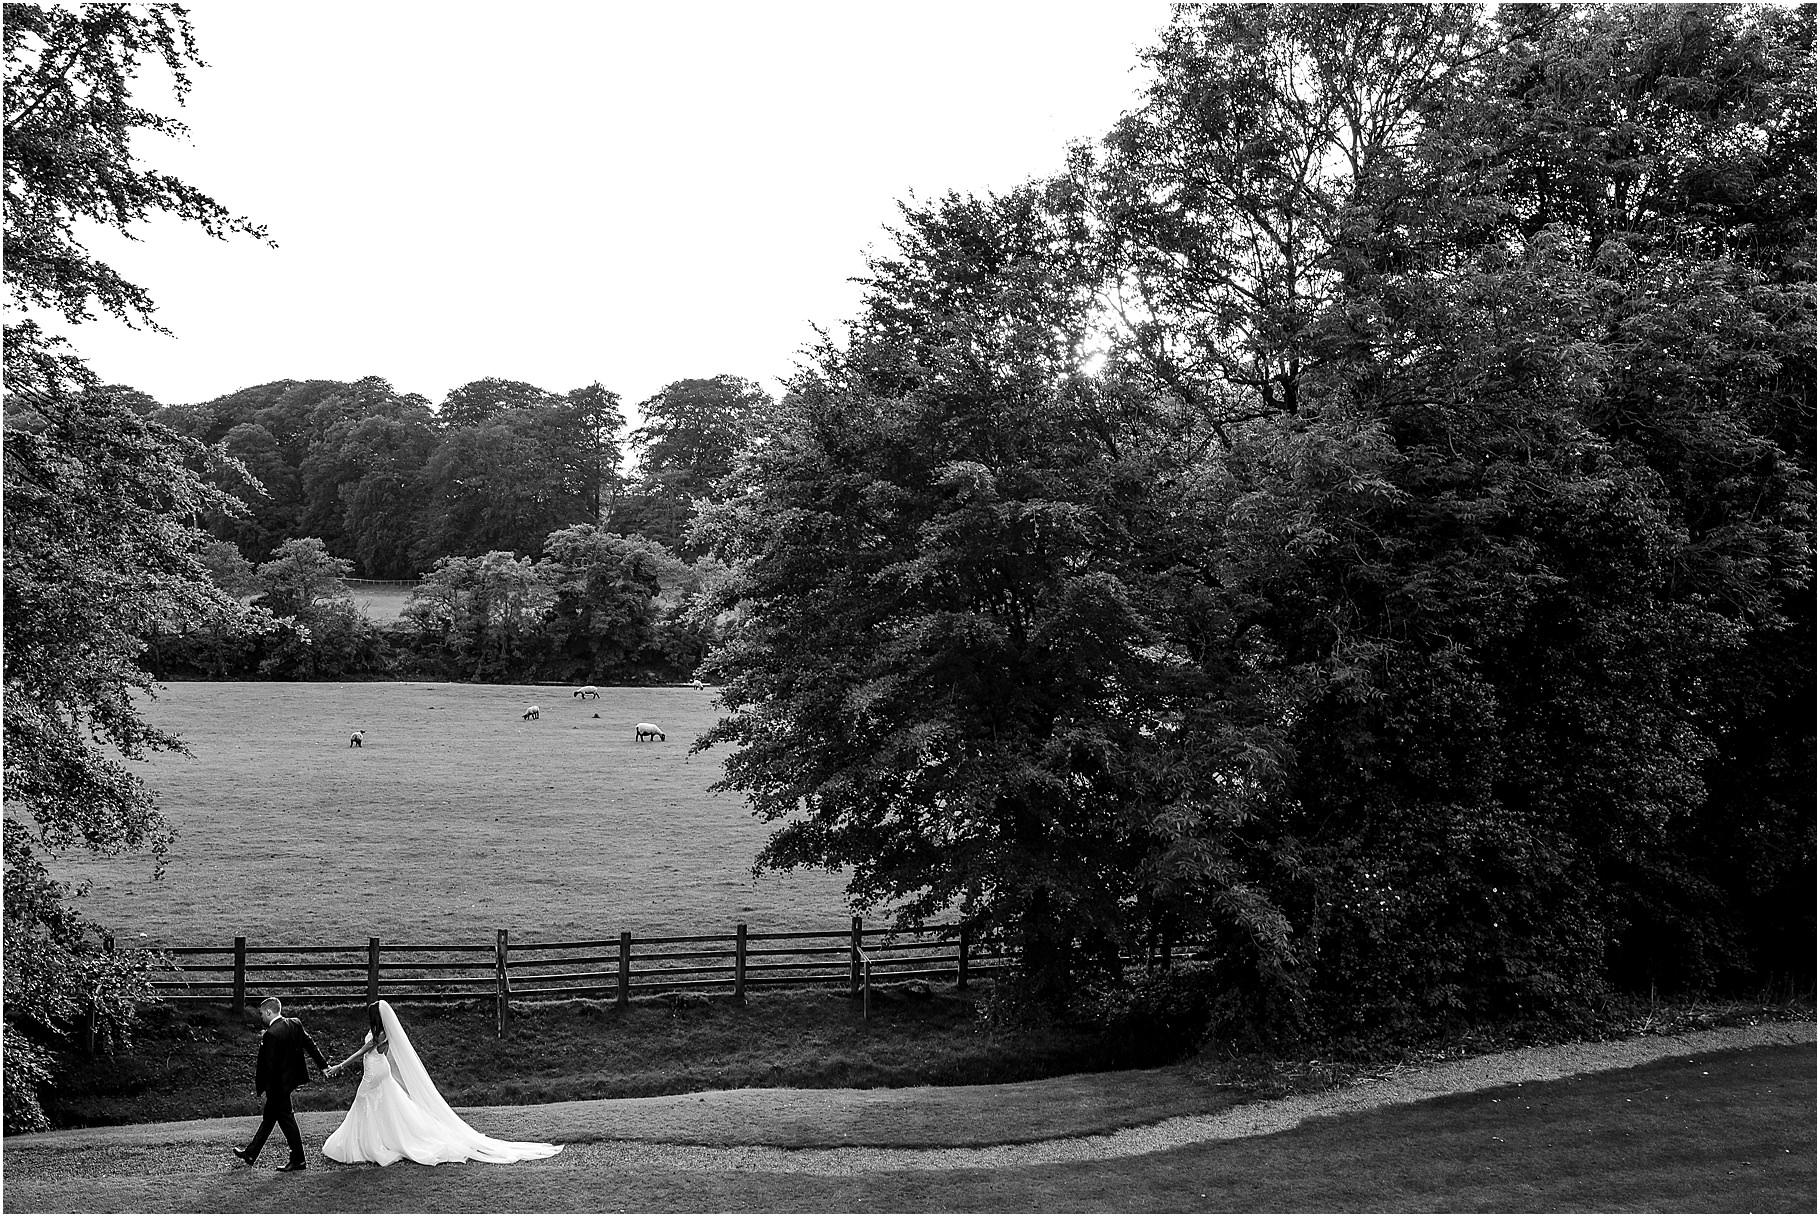 dan-wootton-photography-2017-weddings-088.jpg